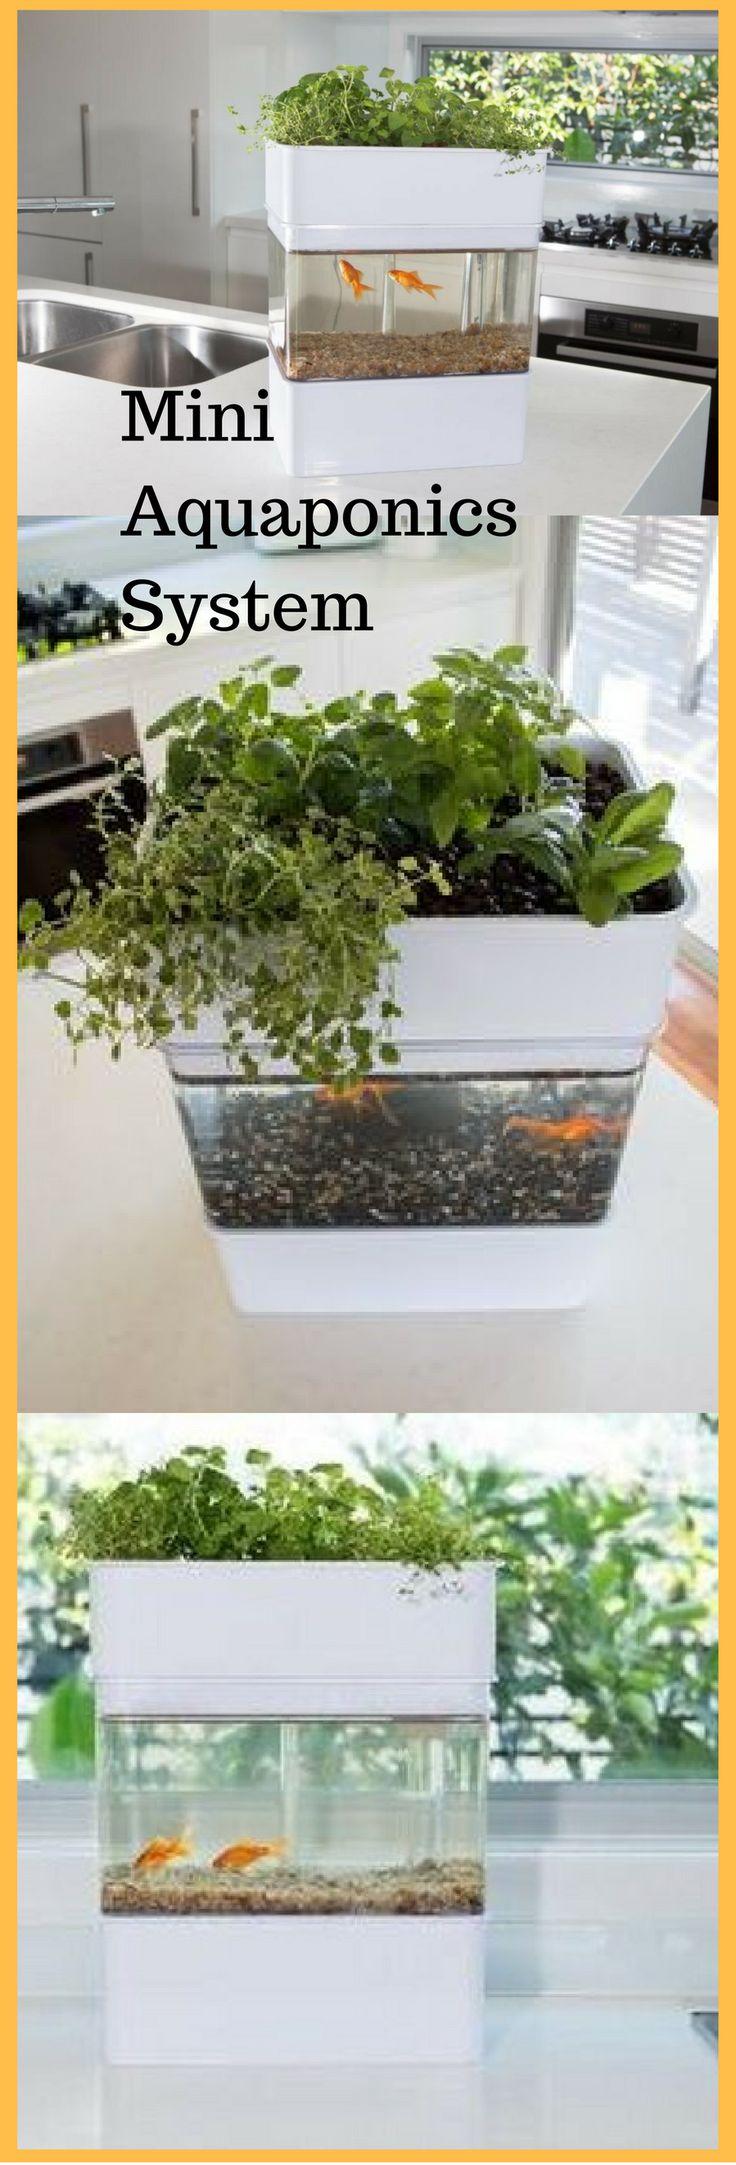 Mini Aquaponics System. What a great way to show a mini ecosystem